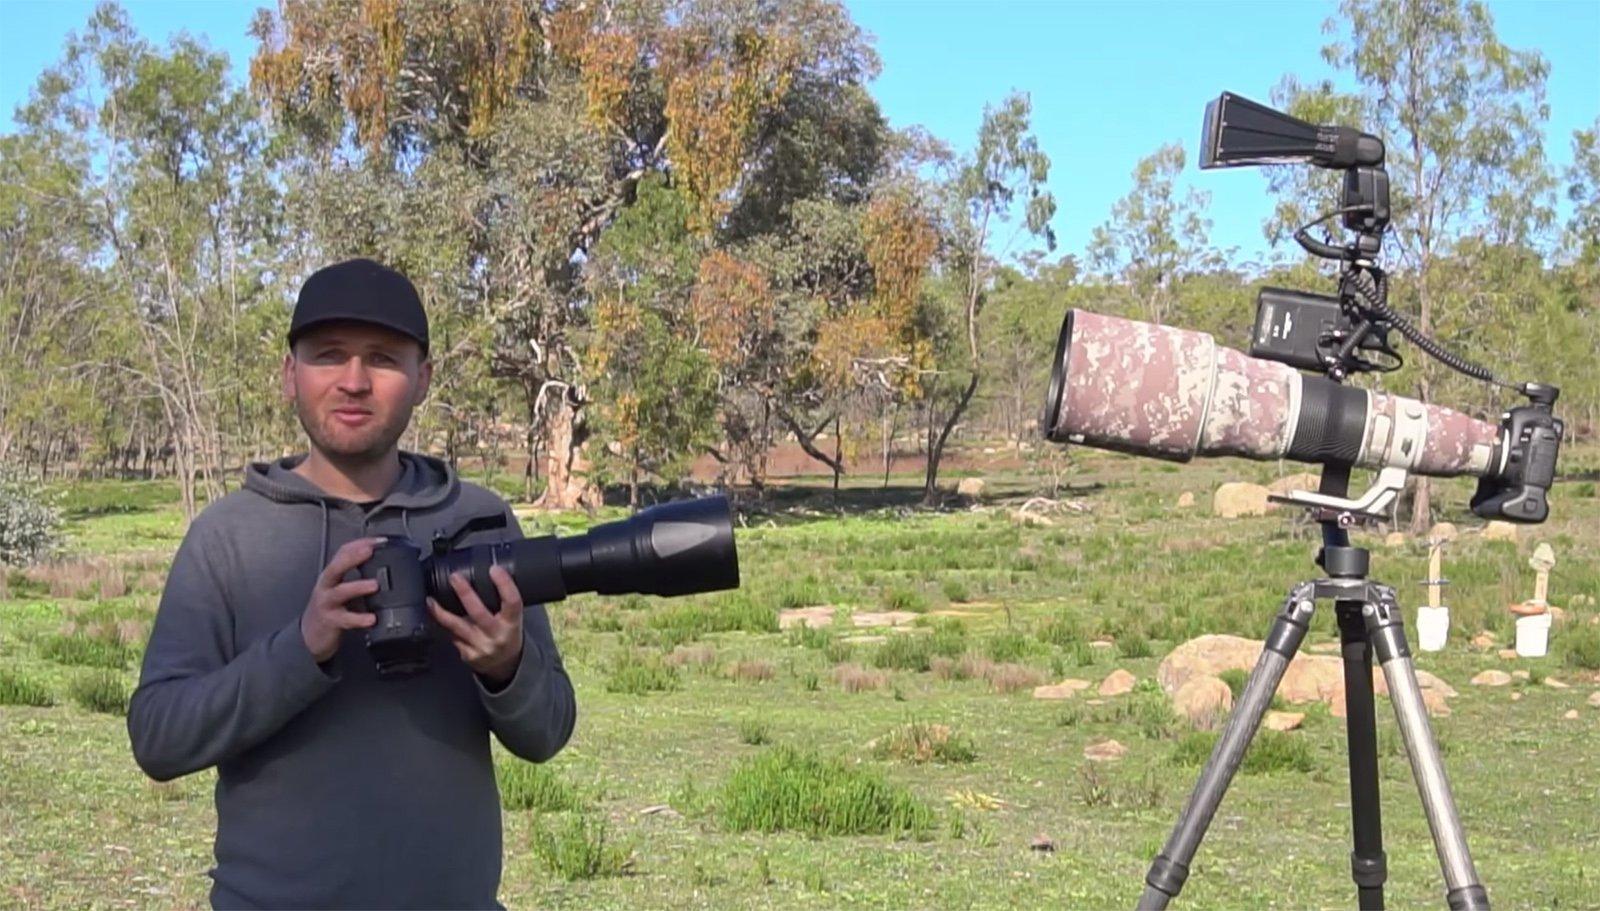 $20,000 vs $2,000: Can You Shoot Professional Bird Photos on a Budget?